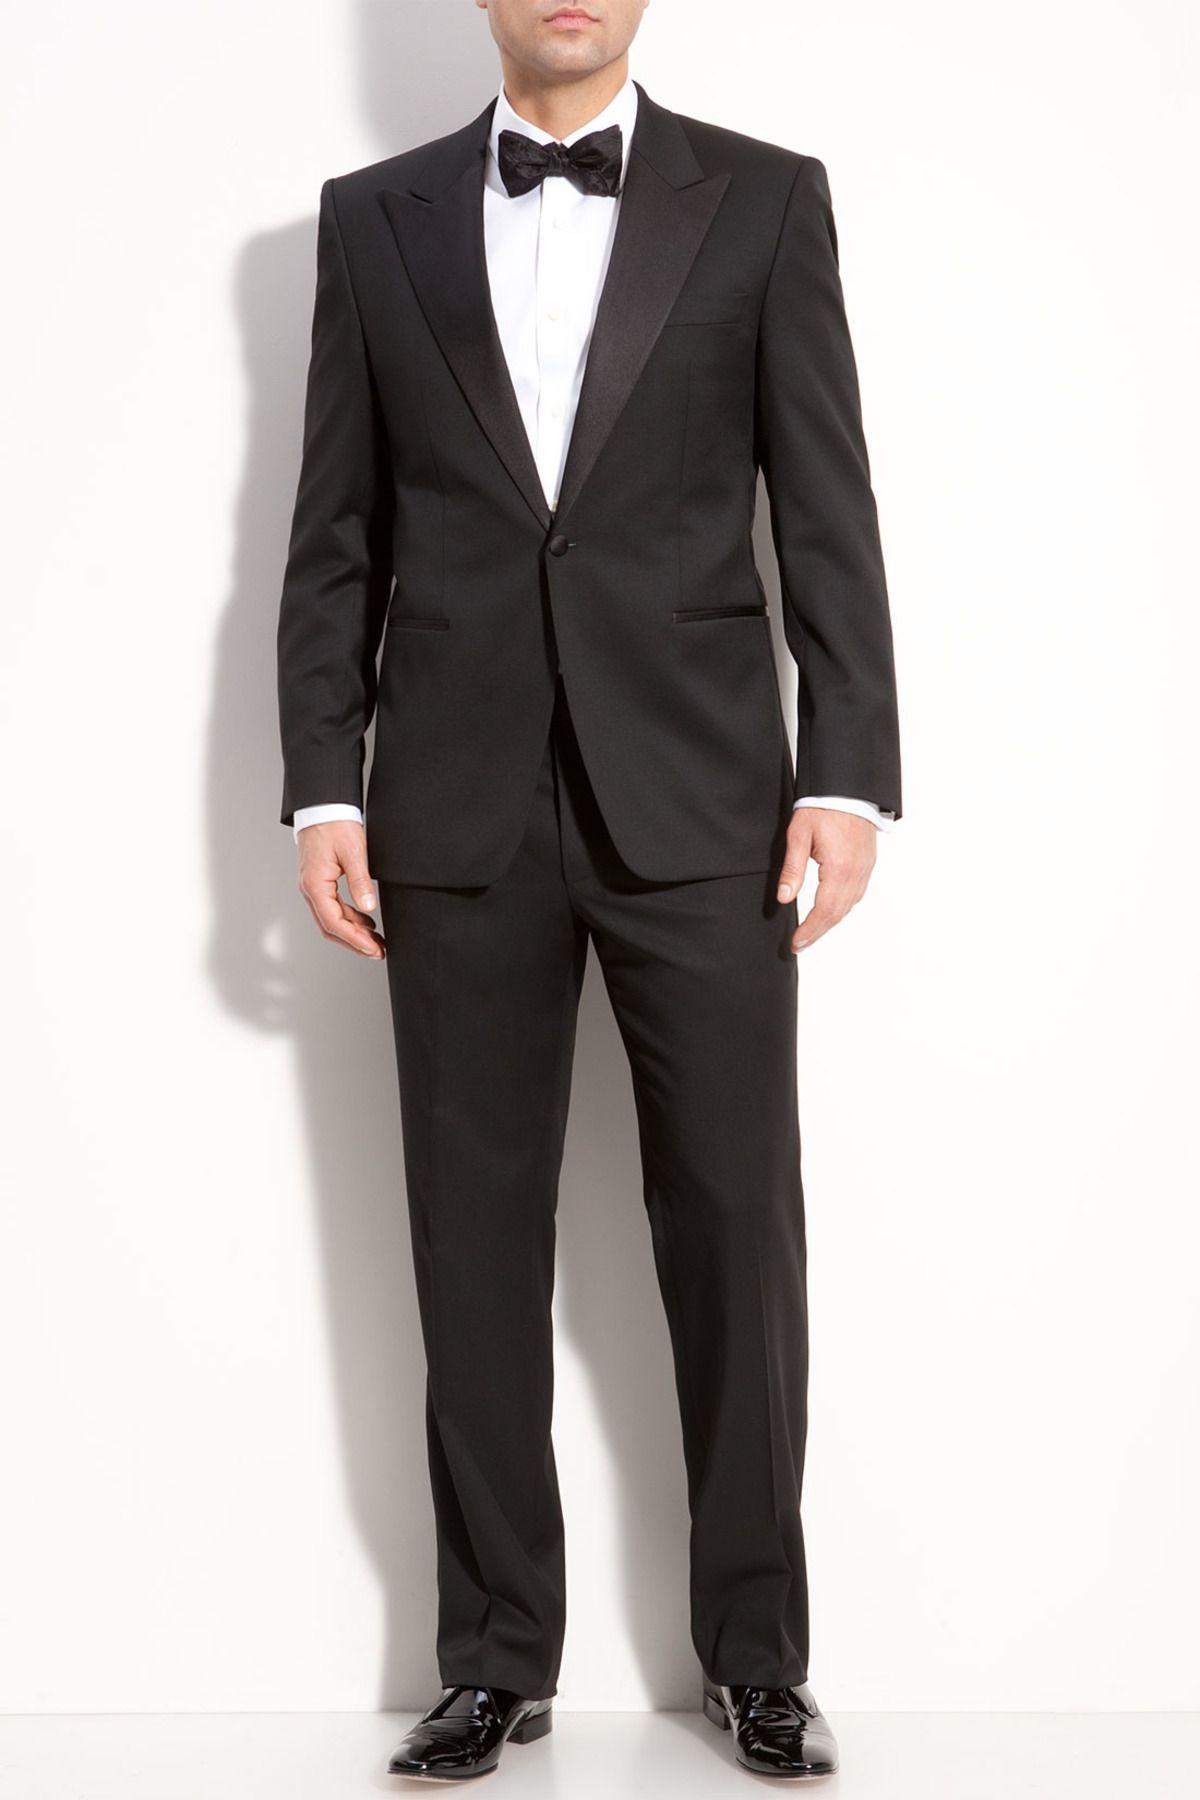 HUGO BOSS   Grant Solid Black One Button Peak Lapel Wool Suit ...